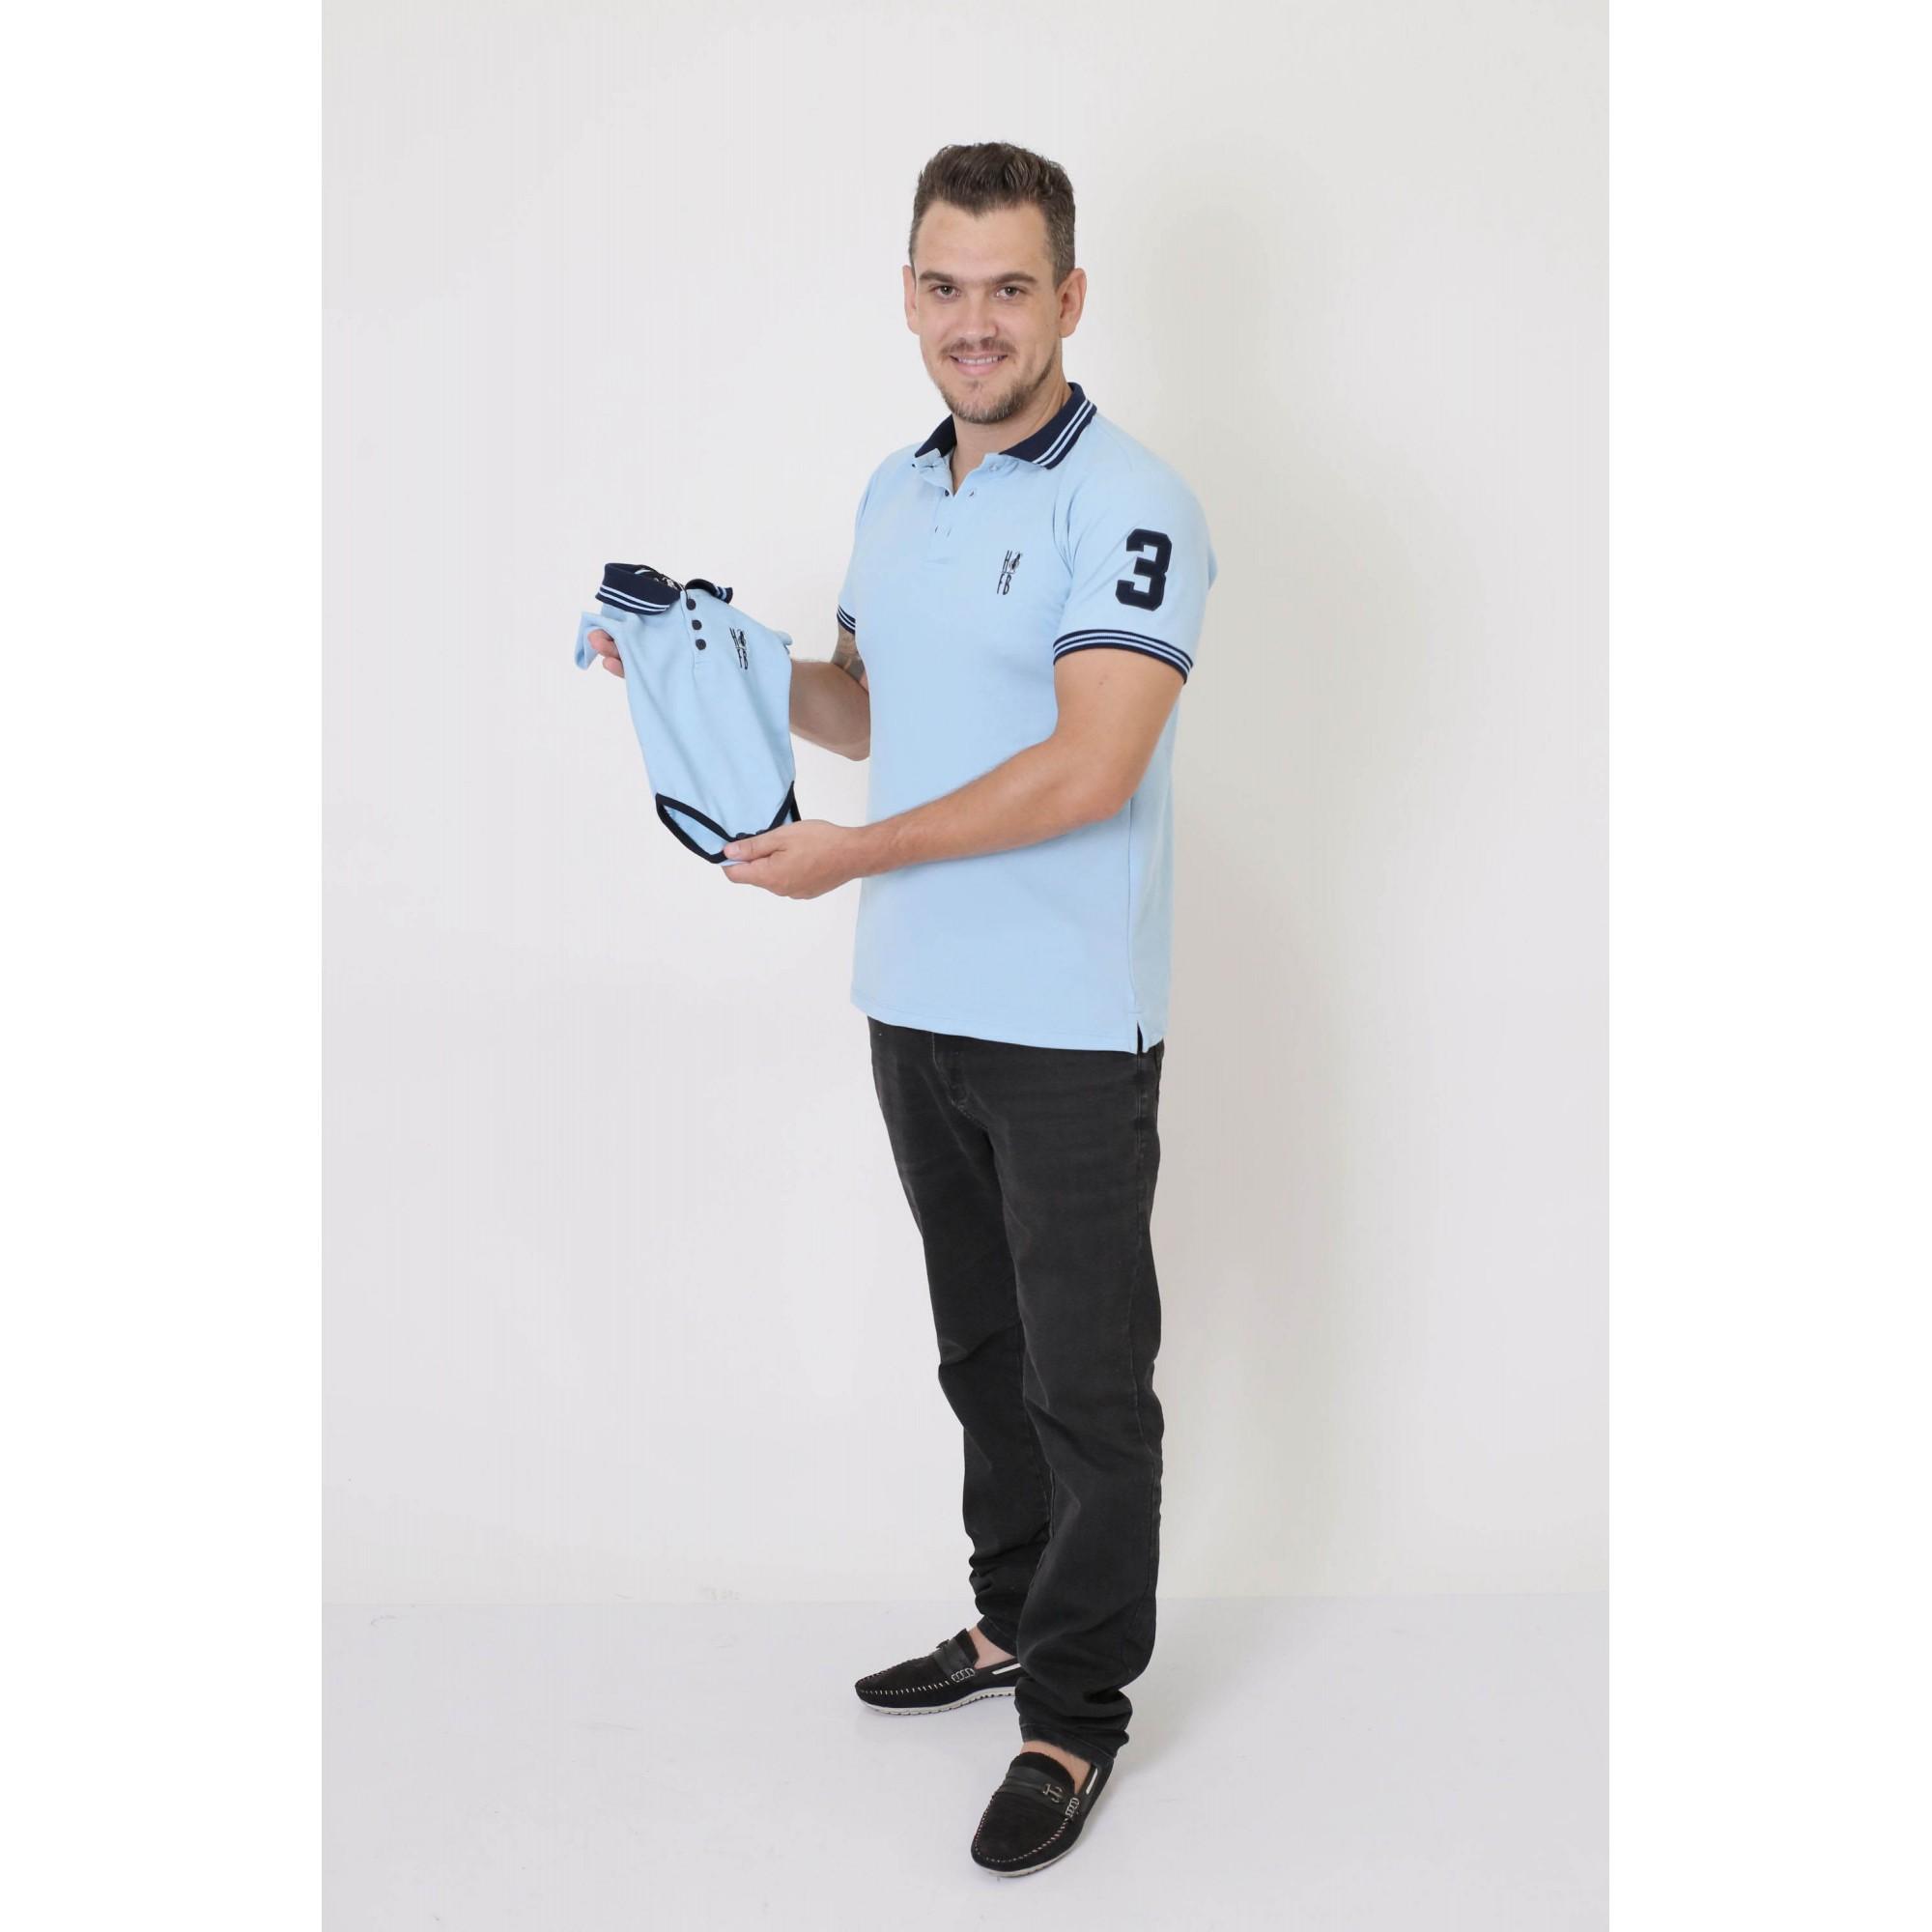 PAI E FILHOS > Kit 02 Peças Camisa + Body Polo - Azul Nobreza [Coleção Tal Pai Tal Filho]  - Heitor Fashion Brazil